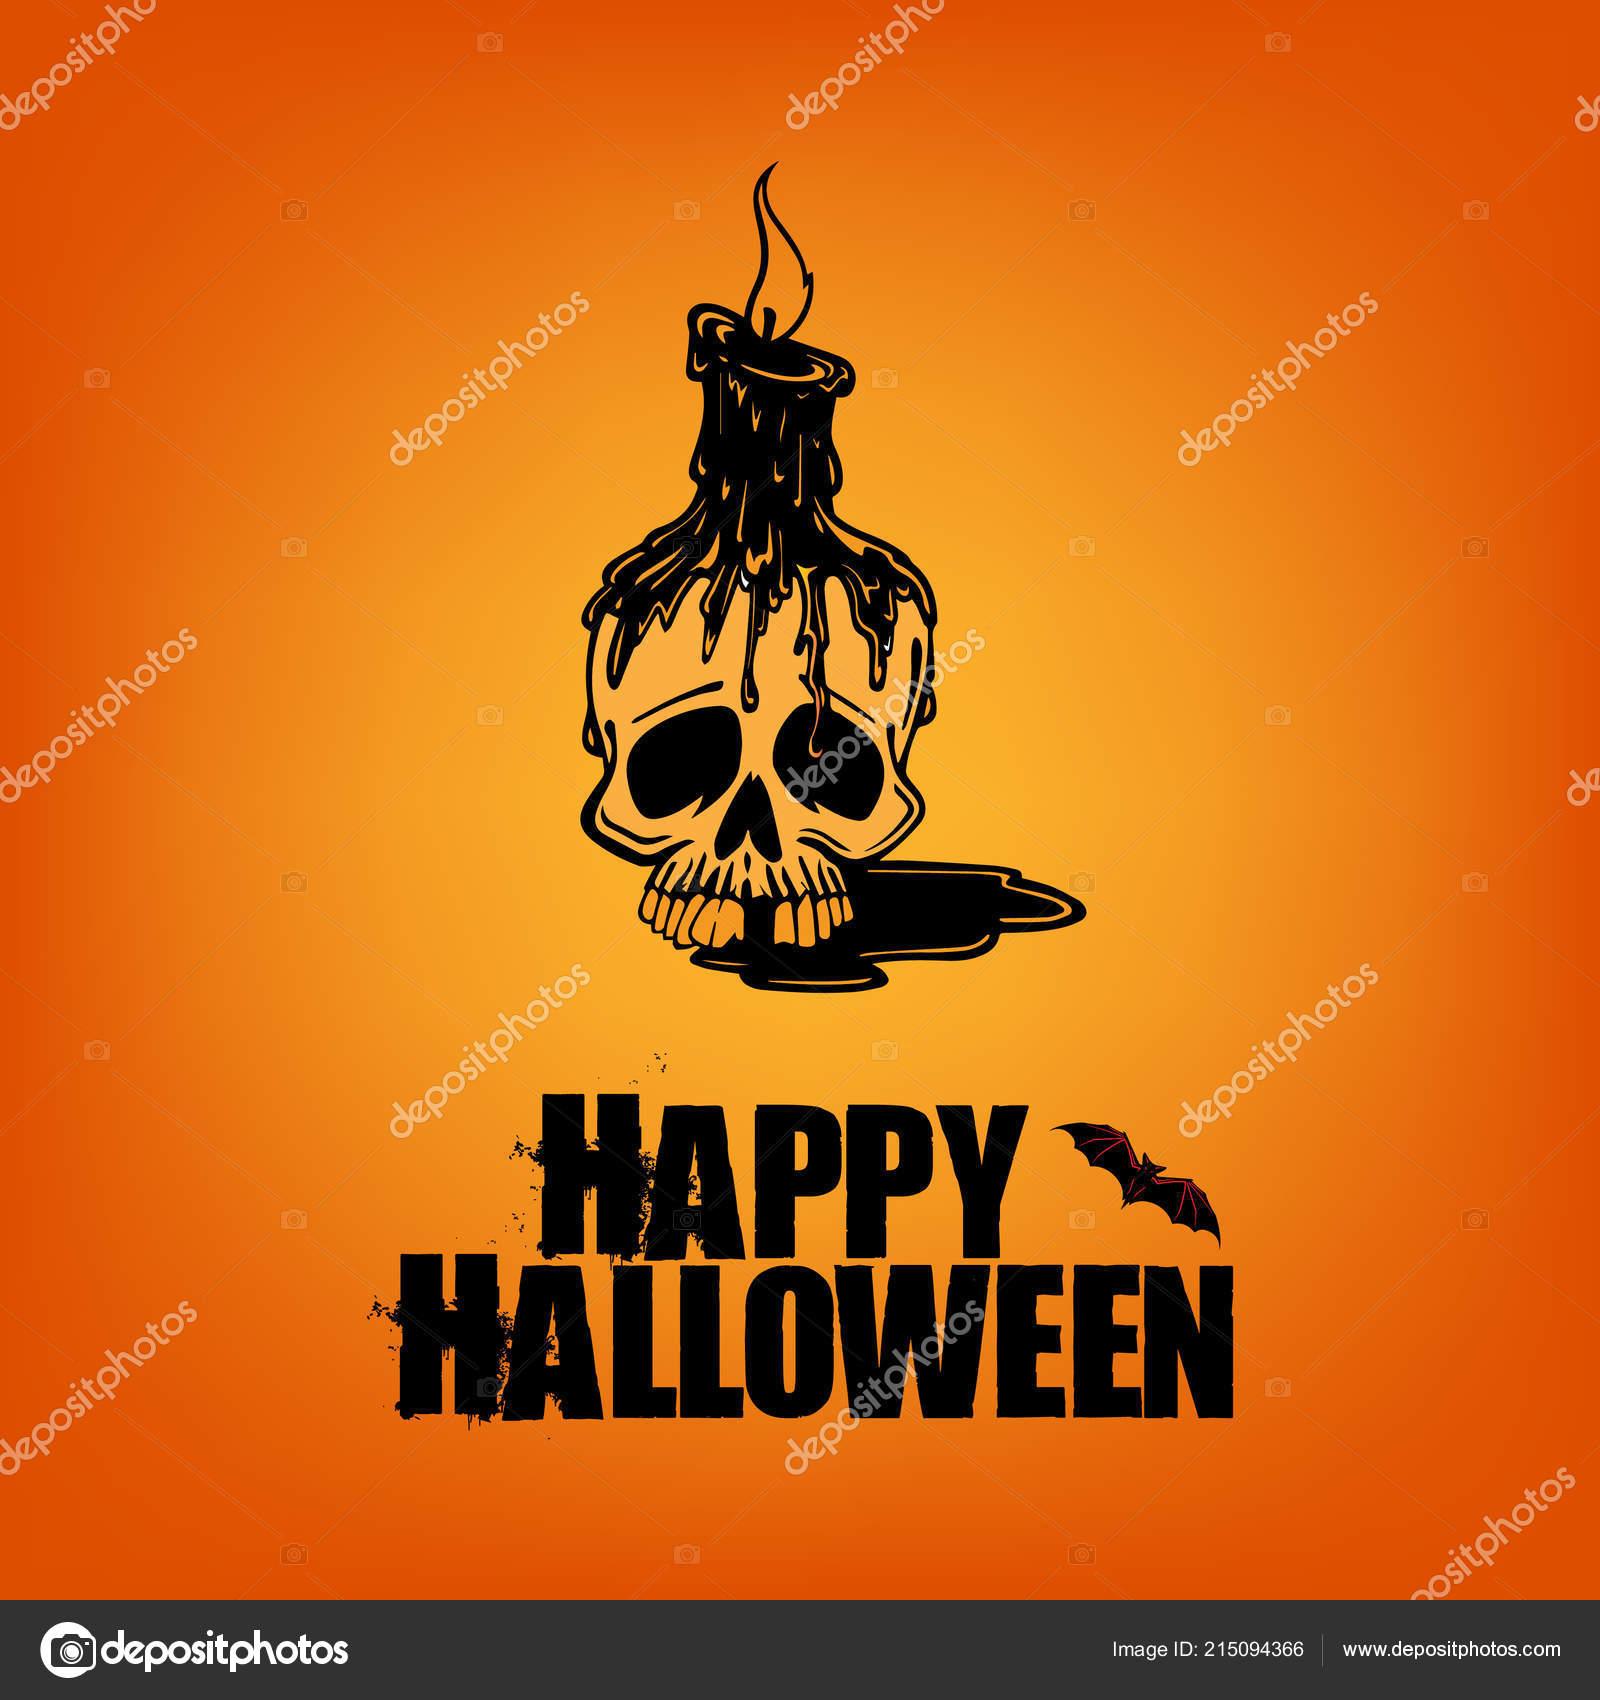 Happy Halloween Poster Wallpaper Flyer Design Scary Skull